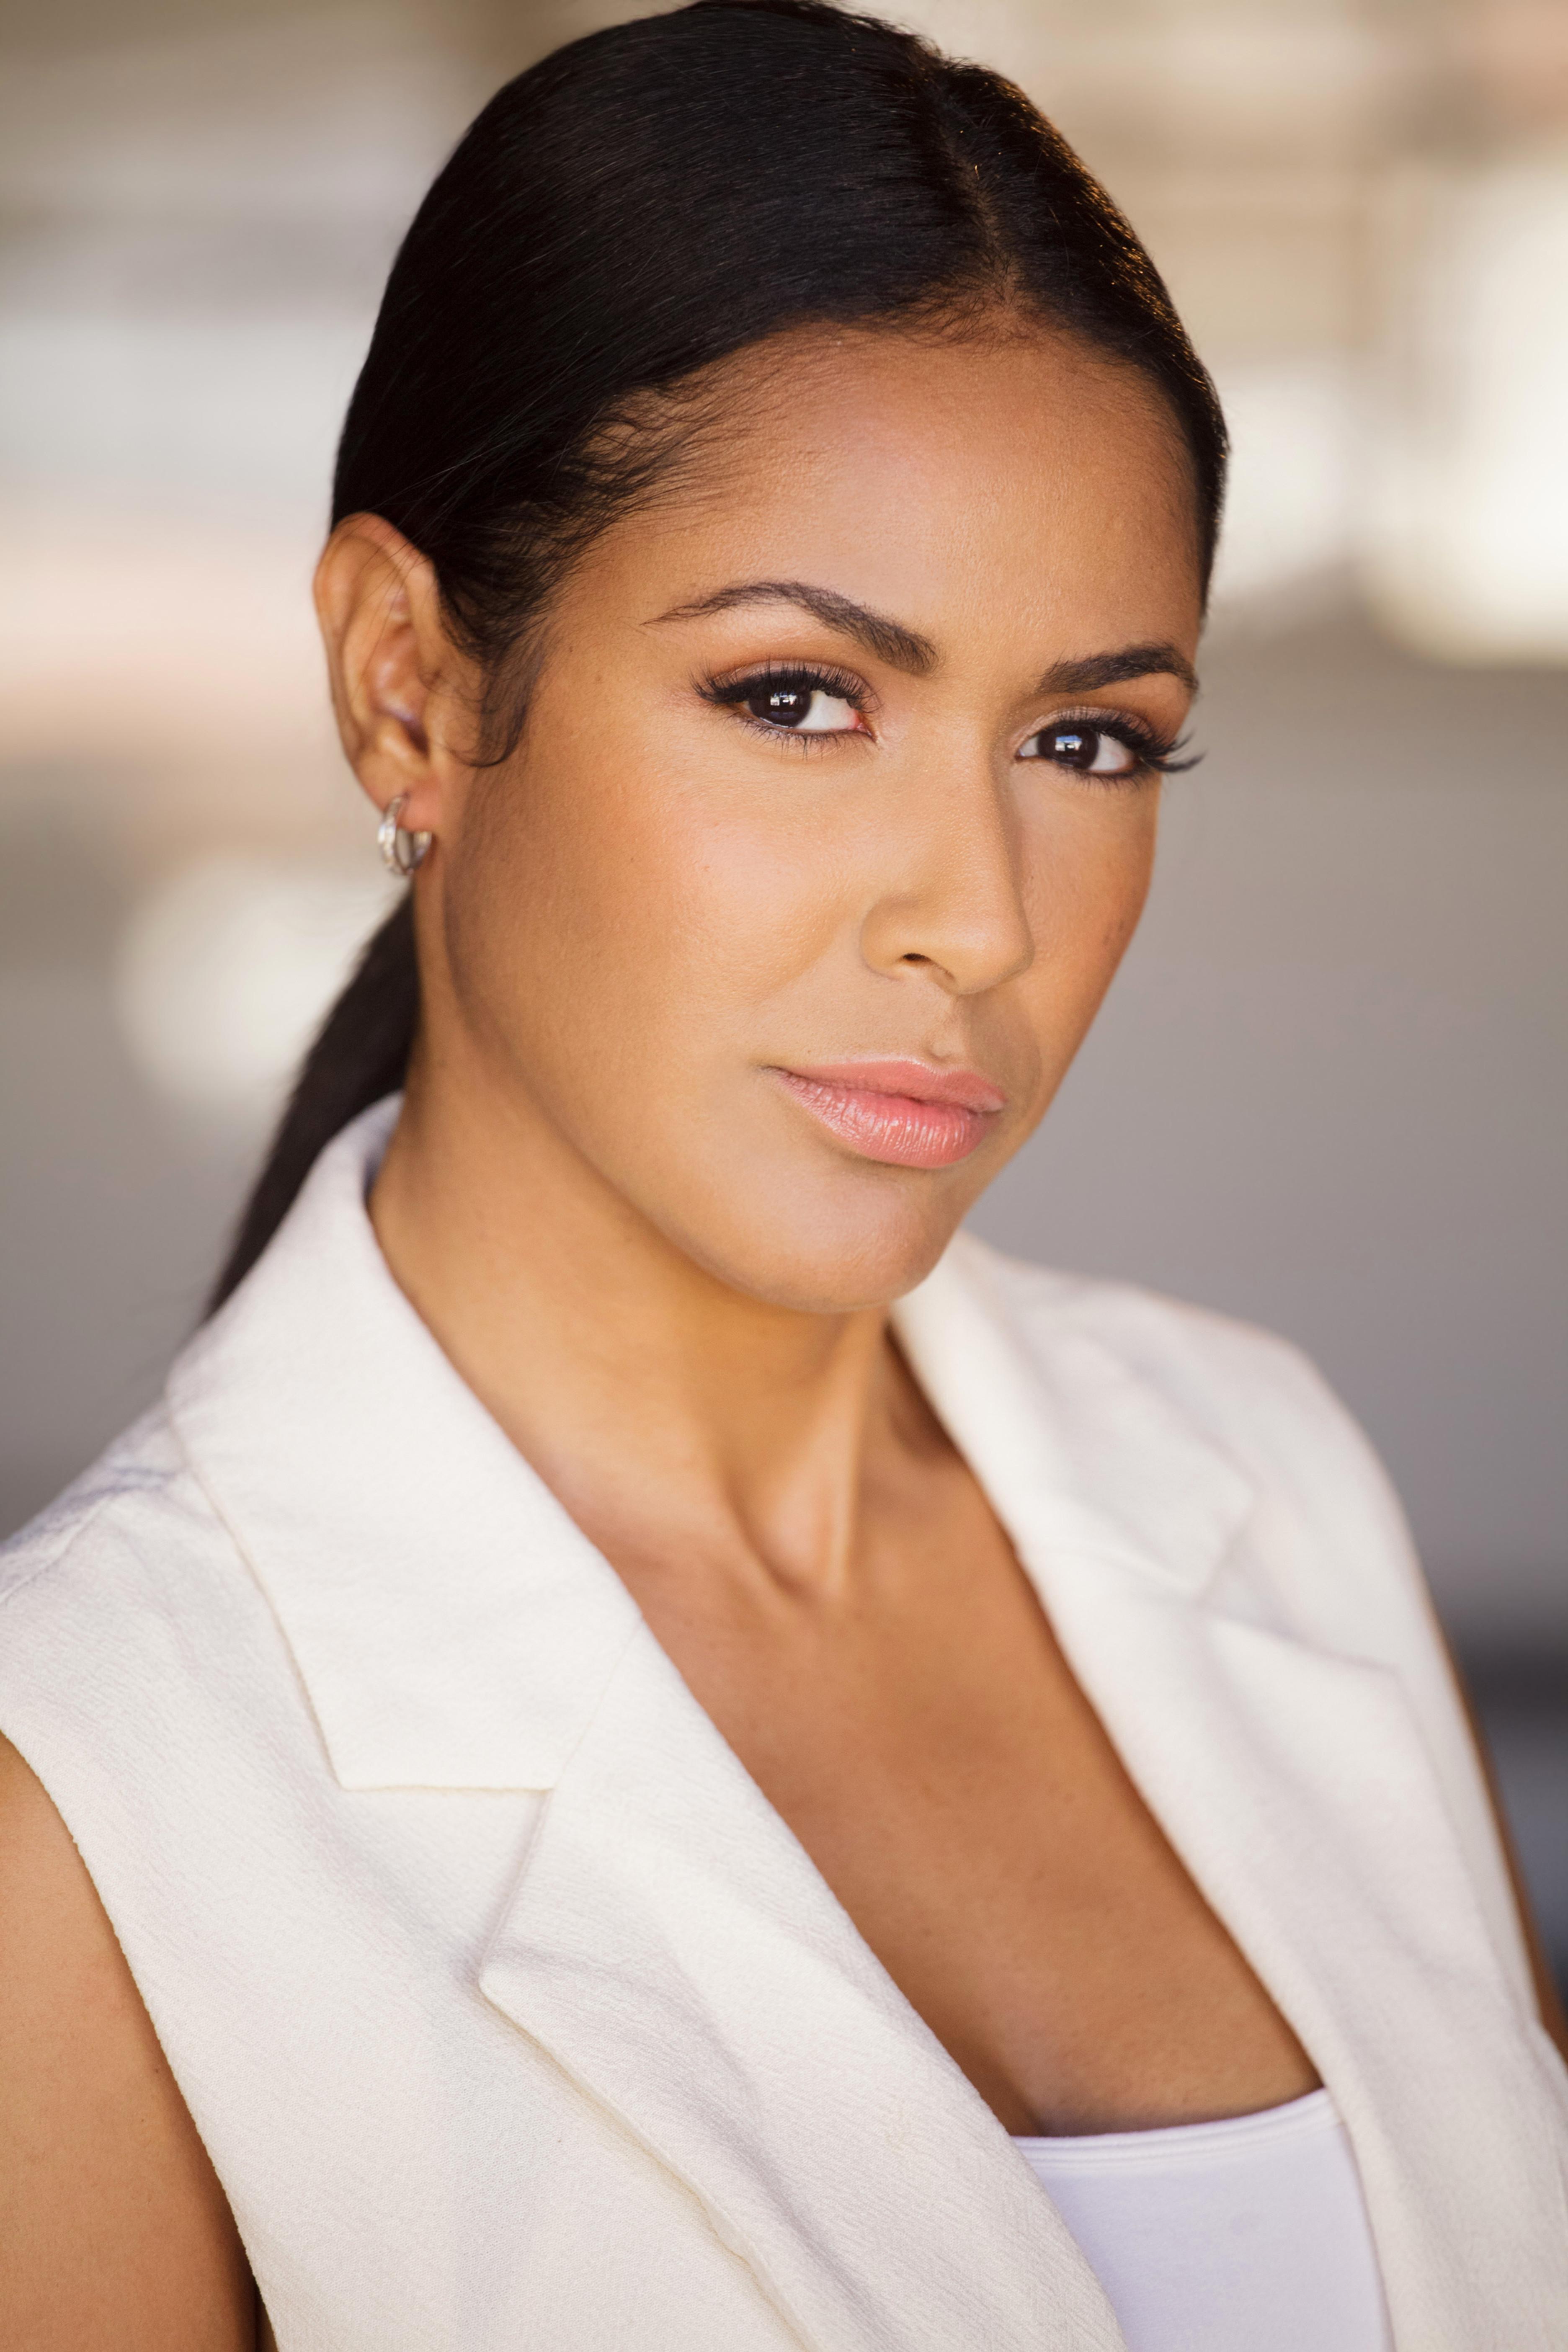 Yissendy Trinidad | Actor